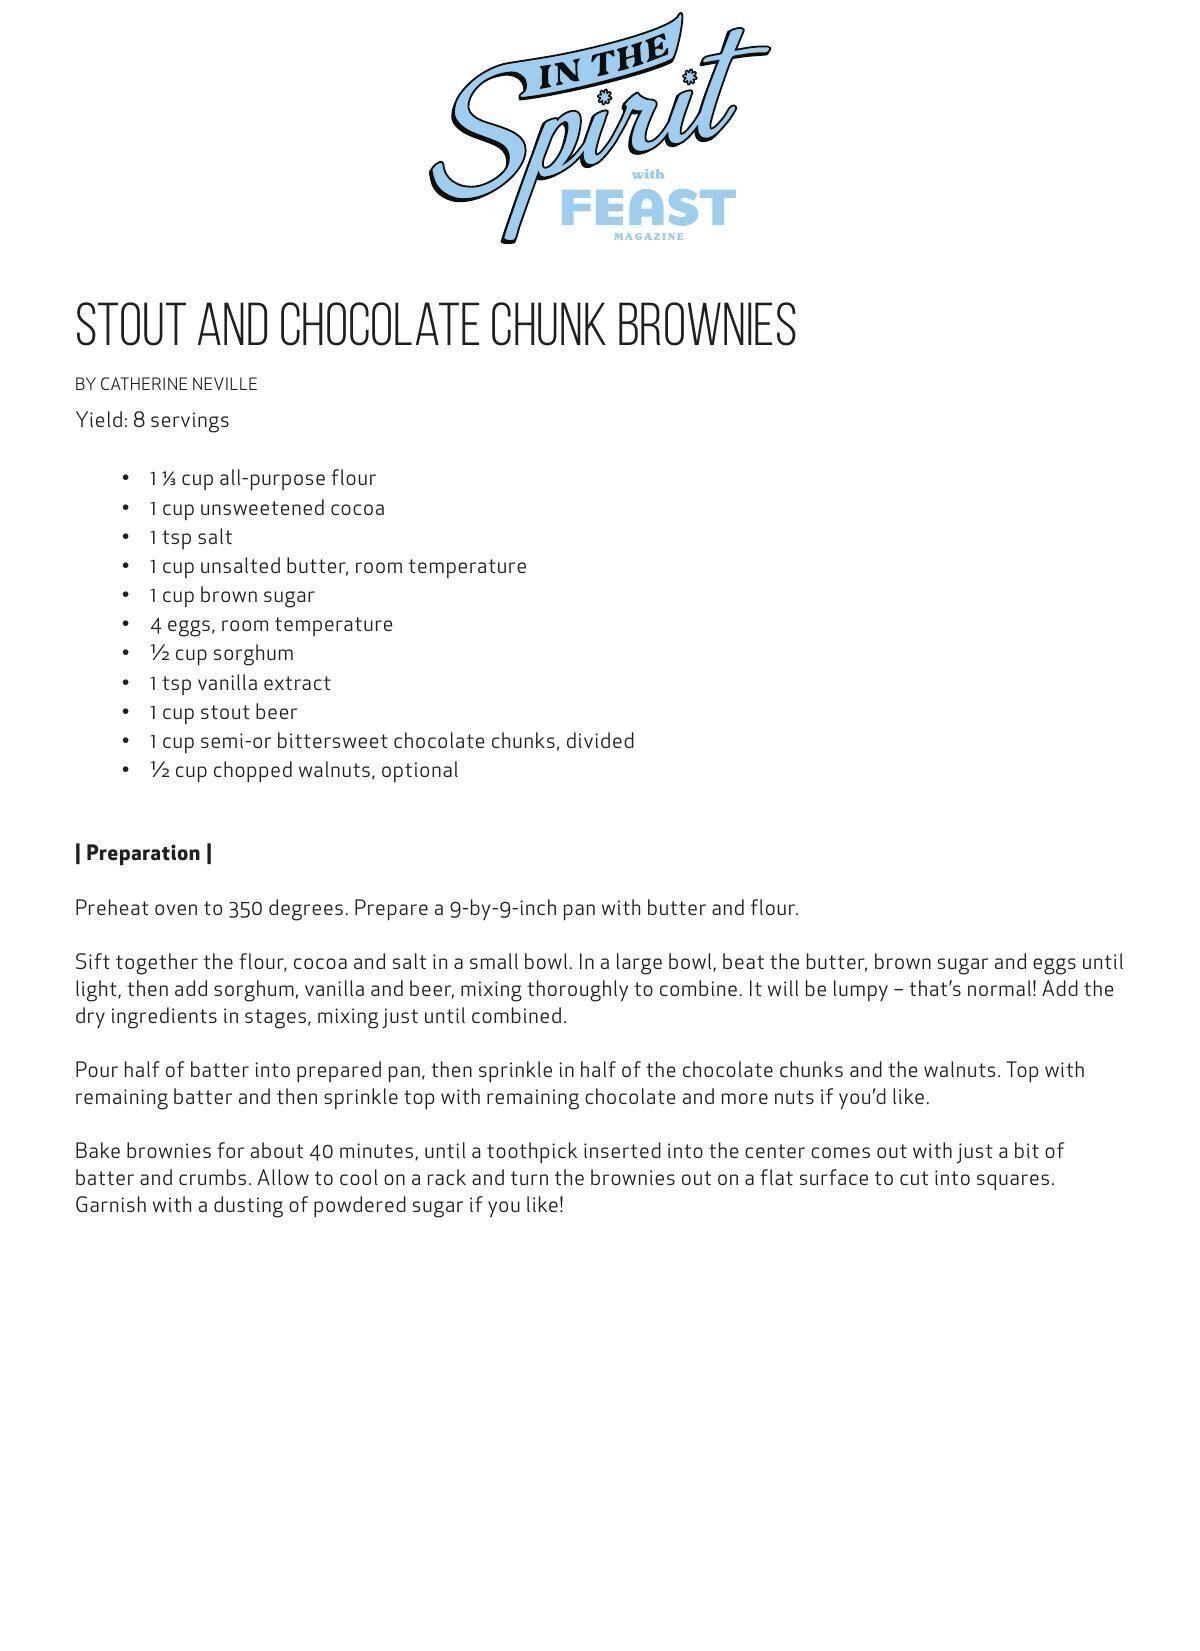 Print this recipe here